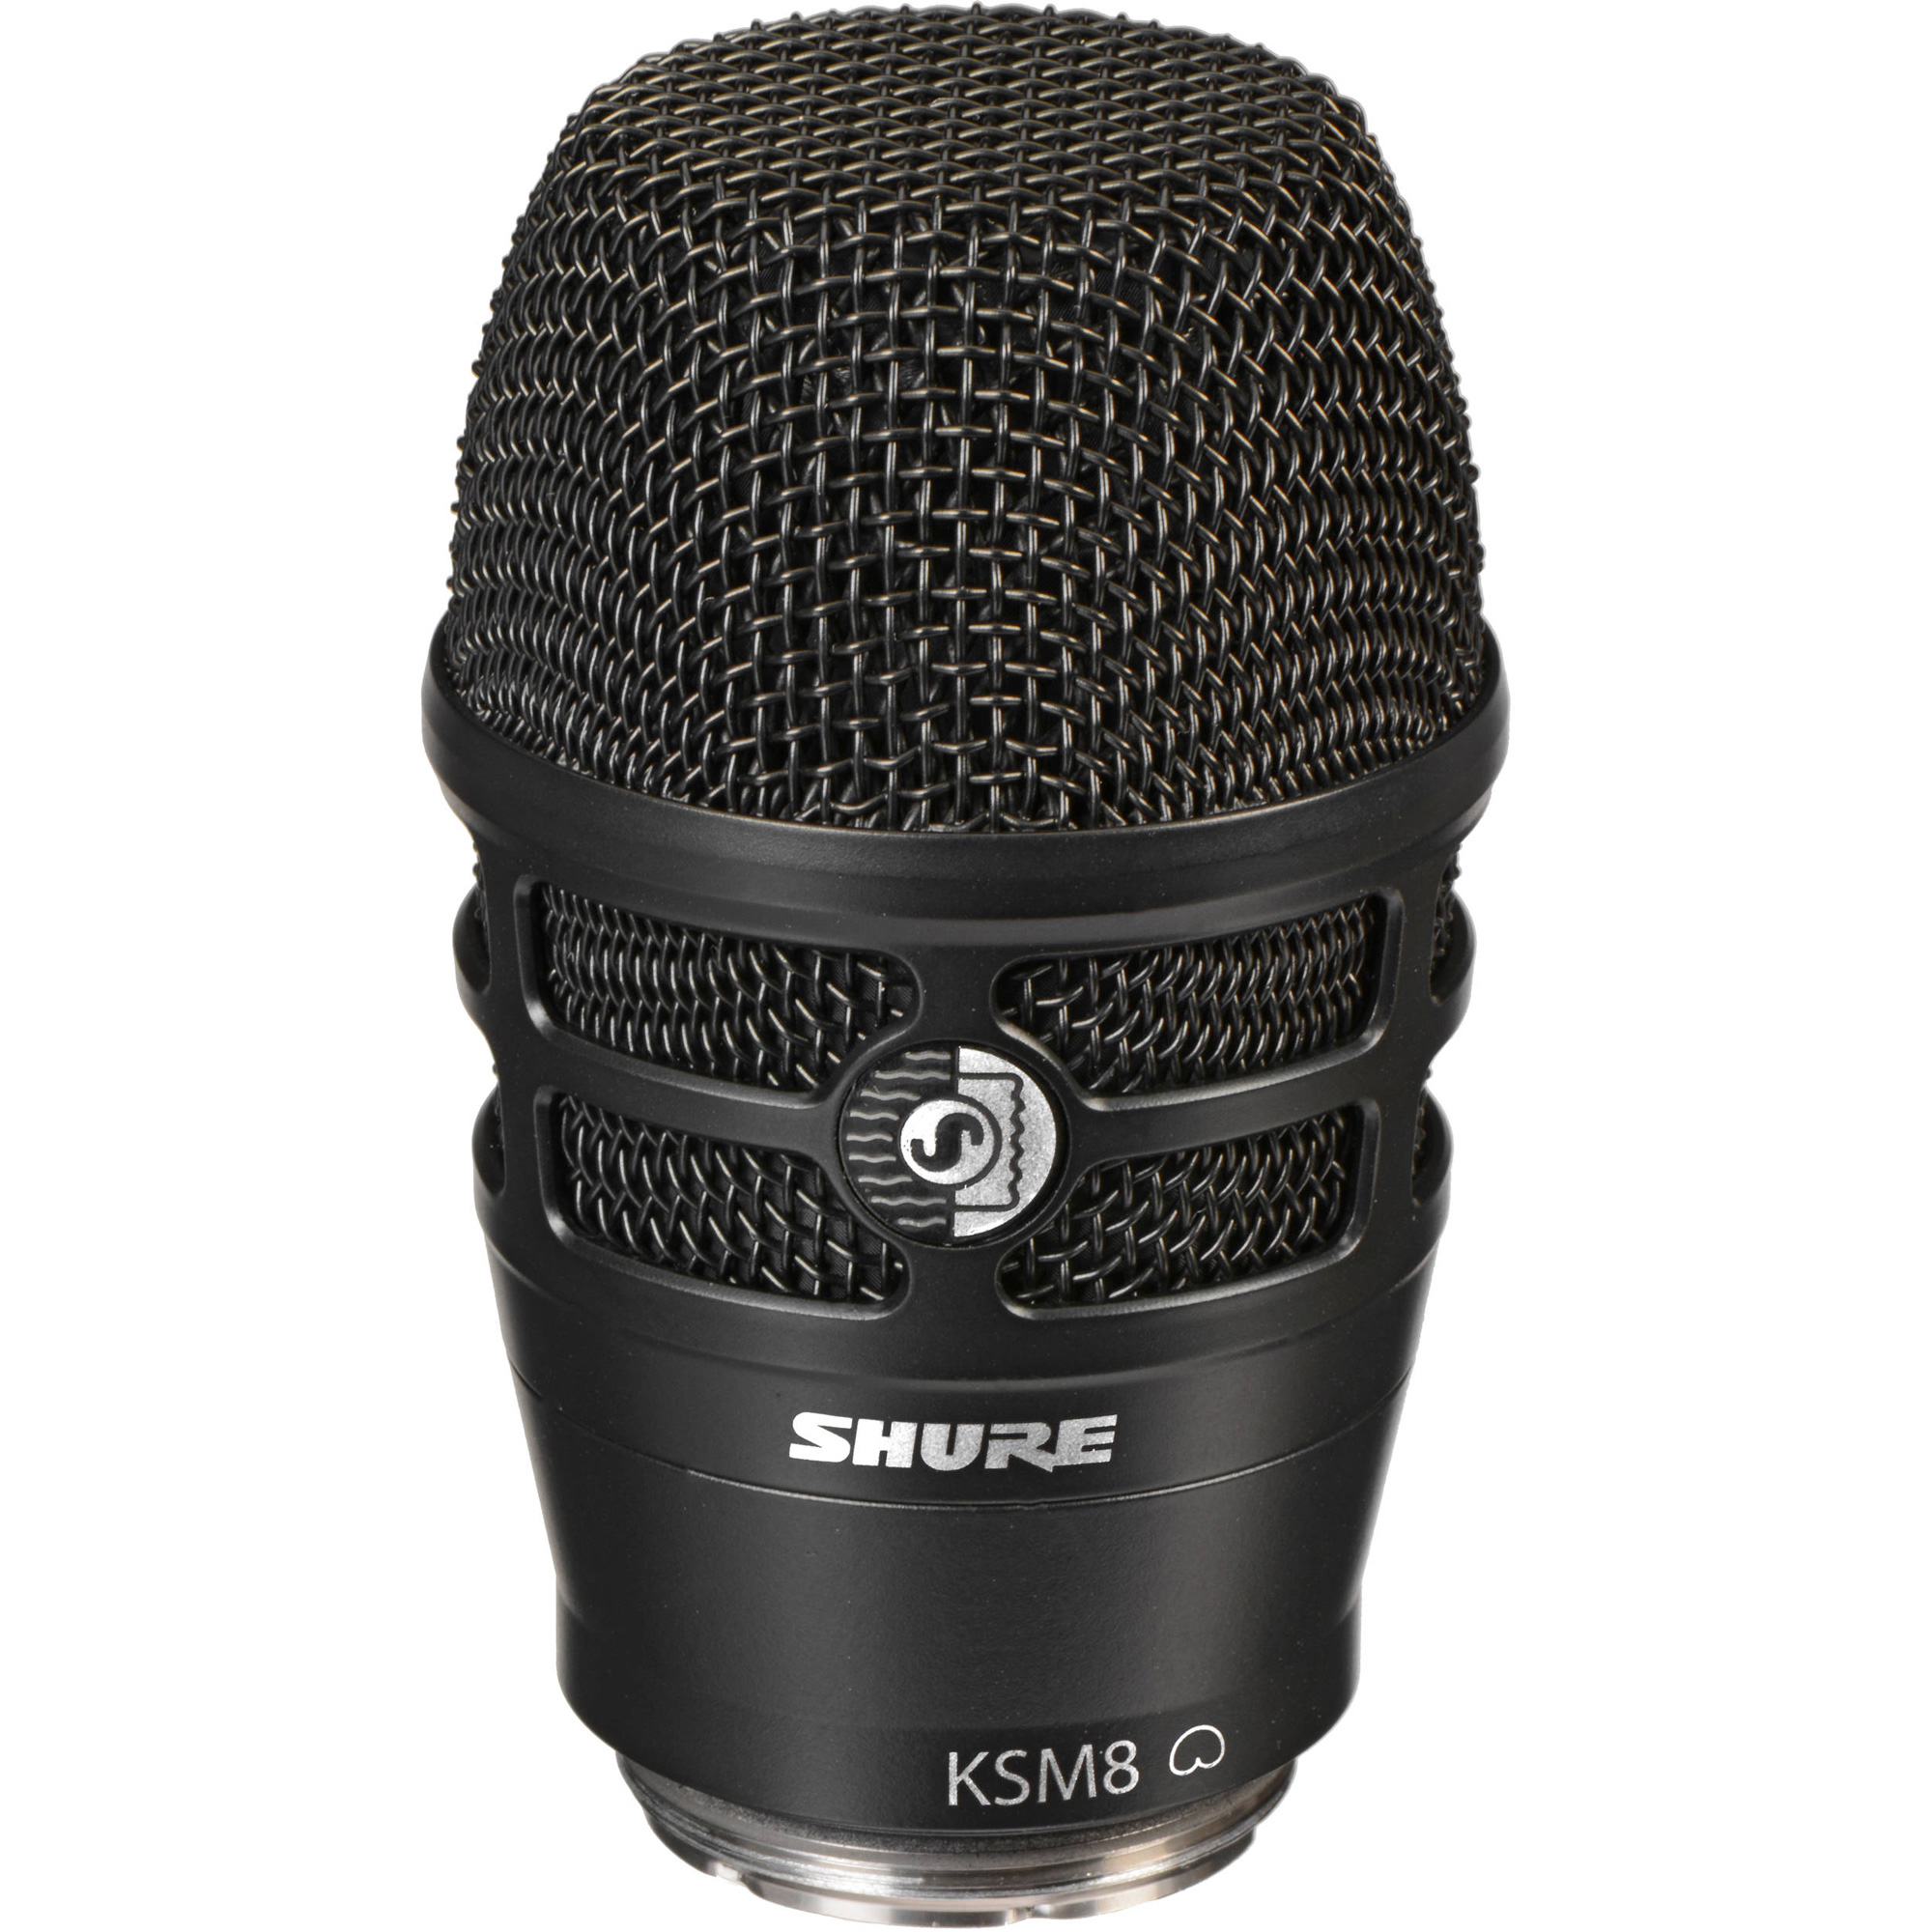 Shure Ksm8 B Dualdyne Dynamic Handheld Vocal Microphone